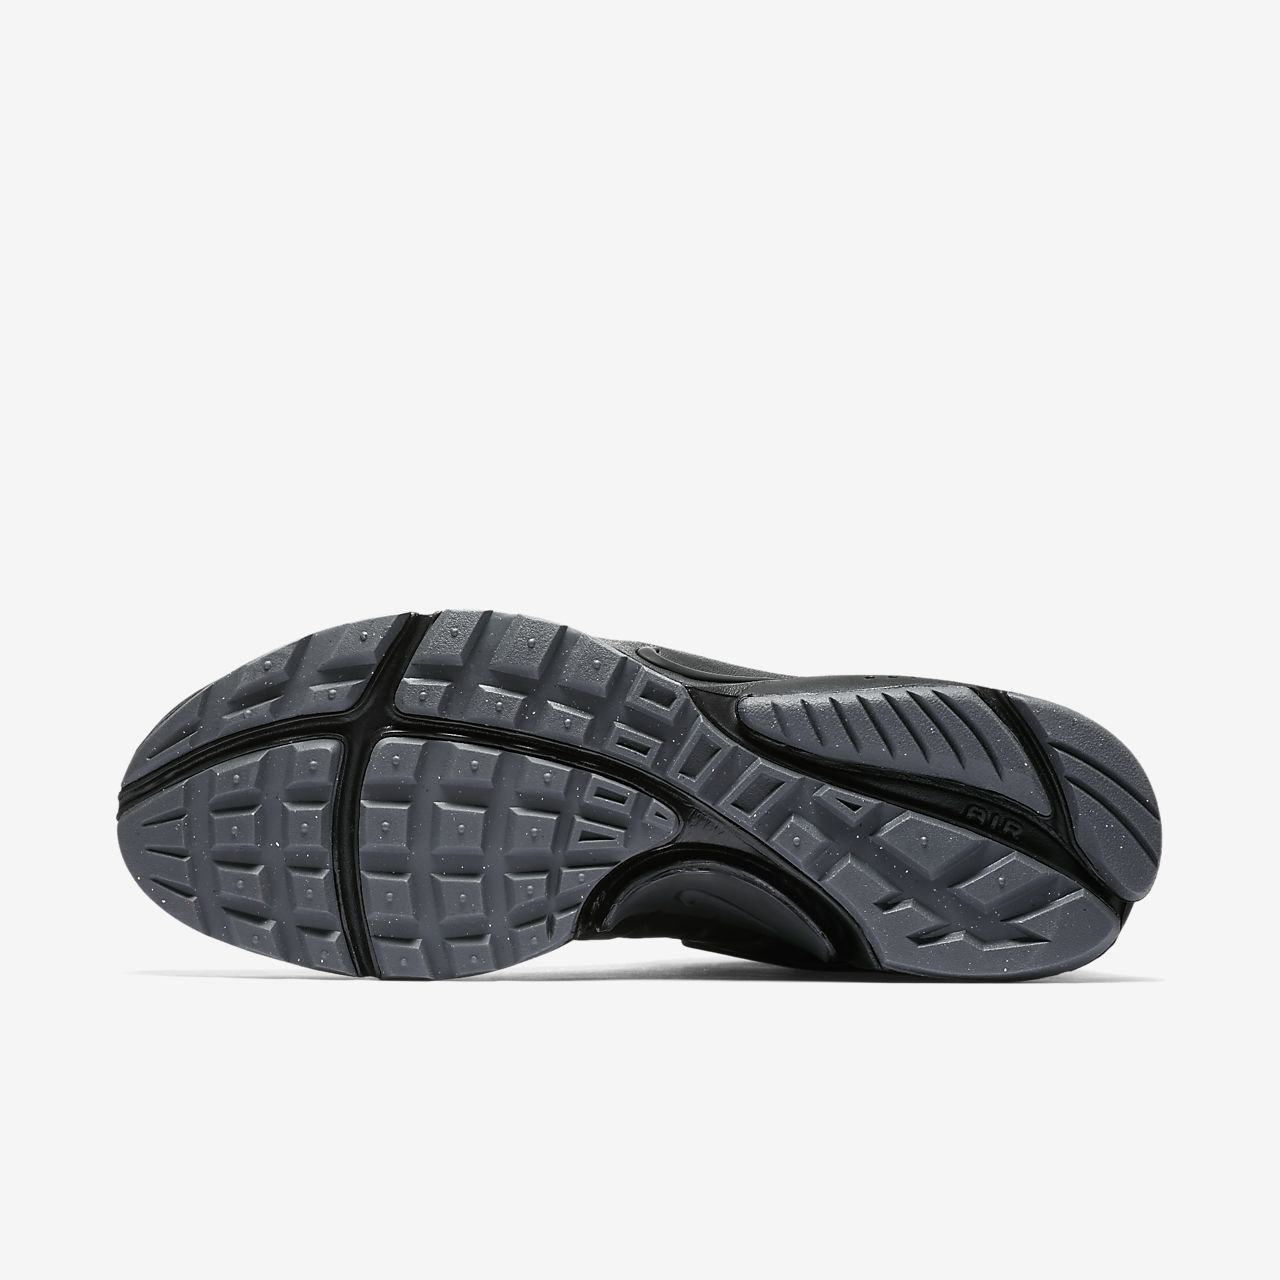 timeless design 7e591 5d058 Nike Air Presto Mid Utility Mens Shoe ...